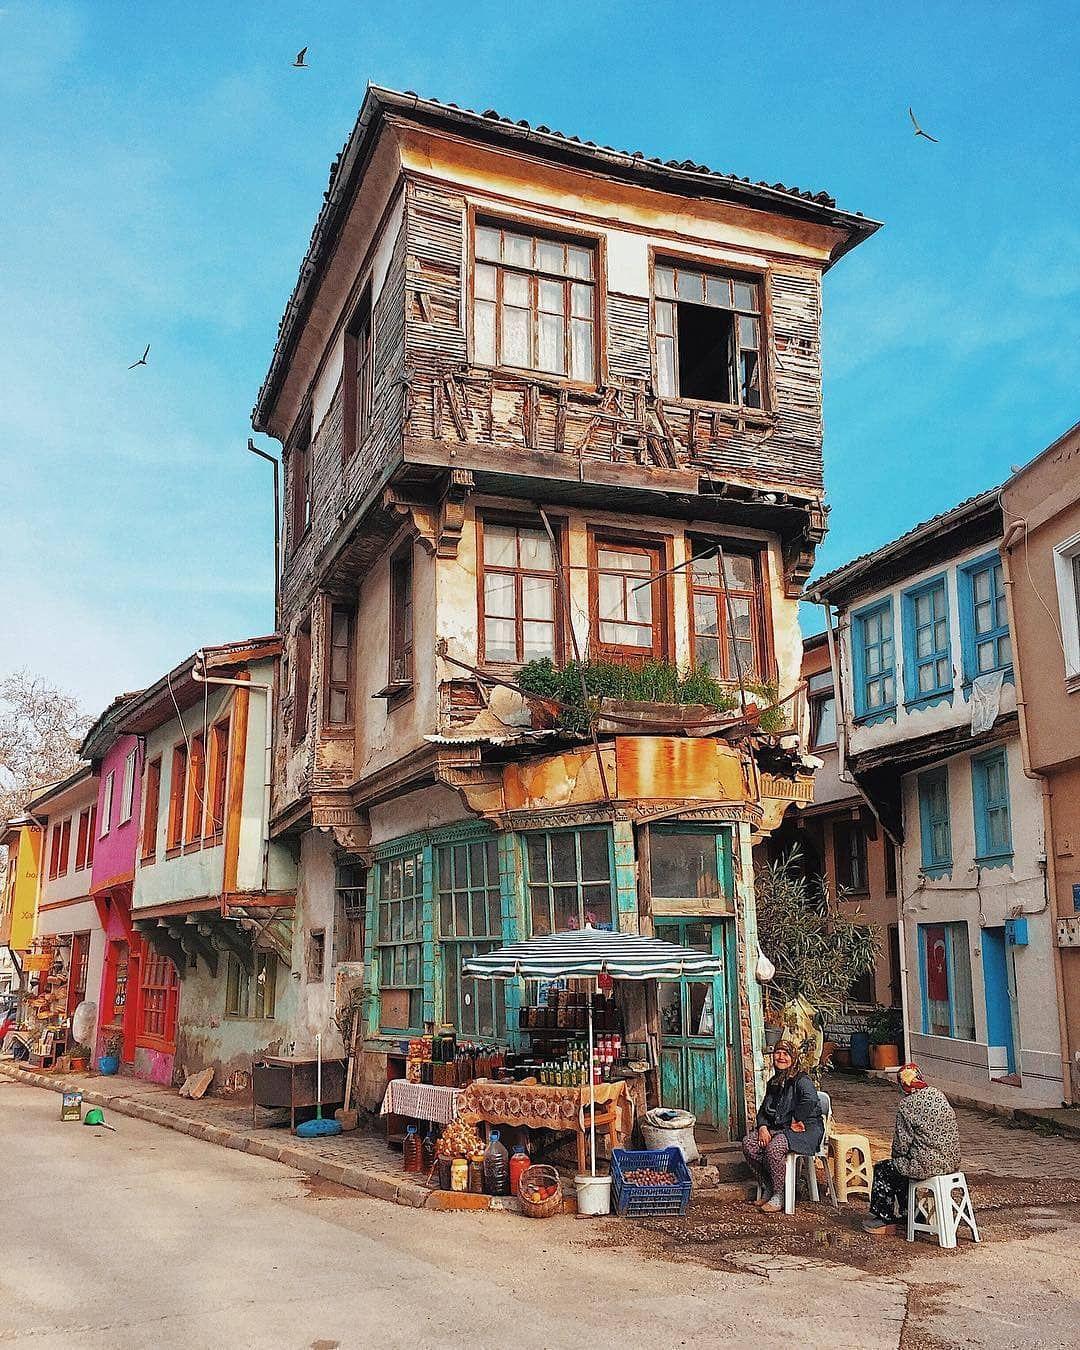 Tirilye, Turkey By @mstfatyfn . 👉 Follow The Featured Feed